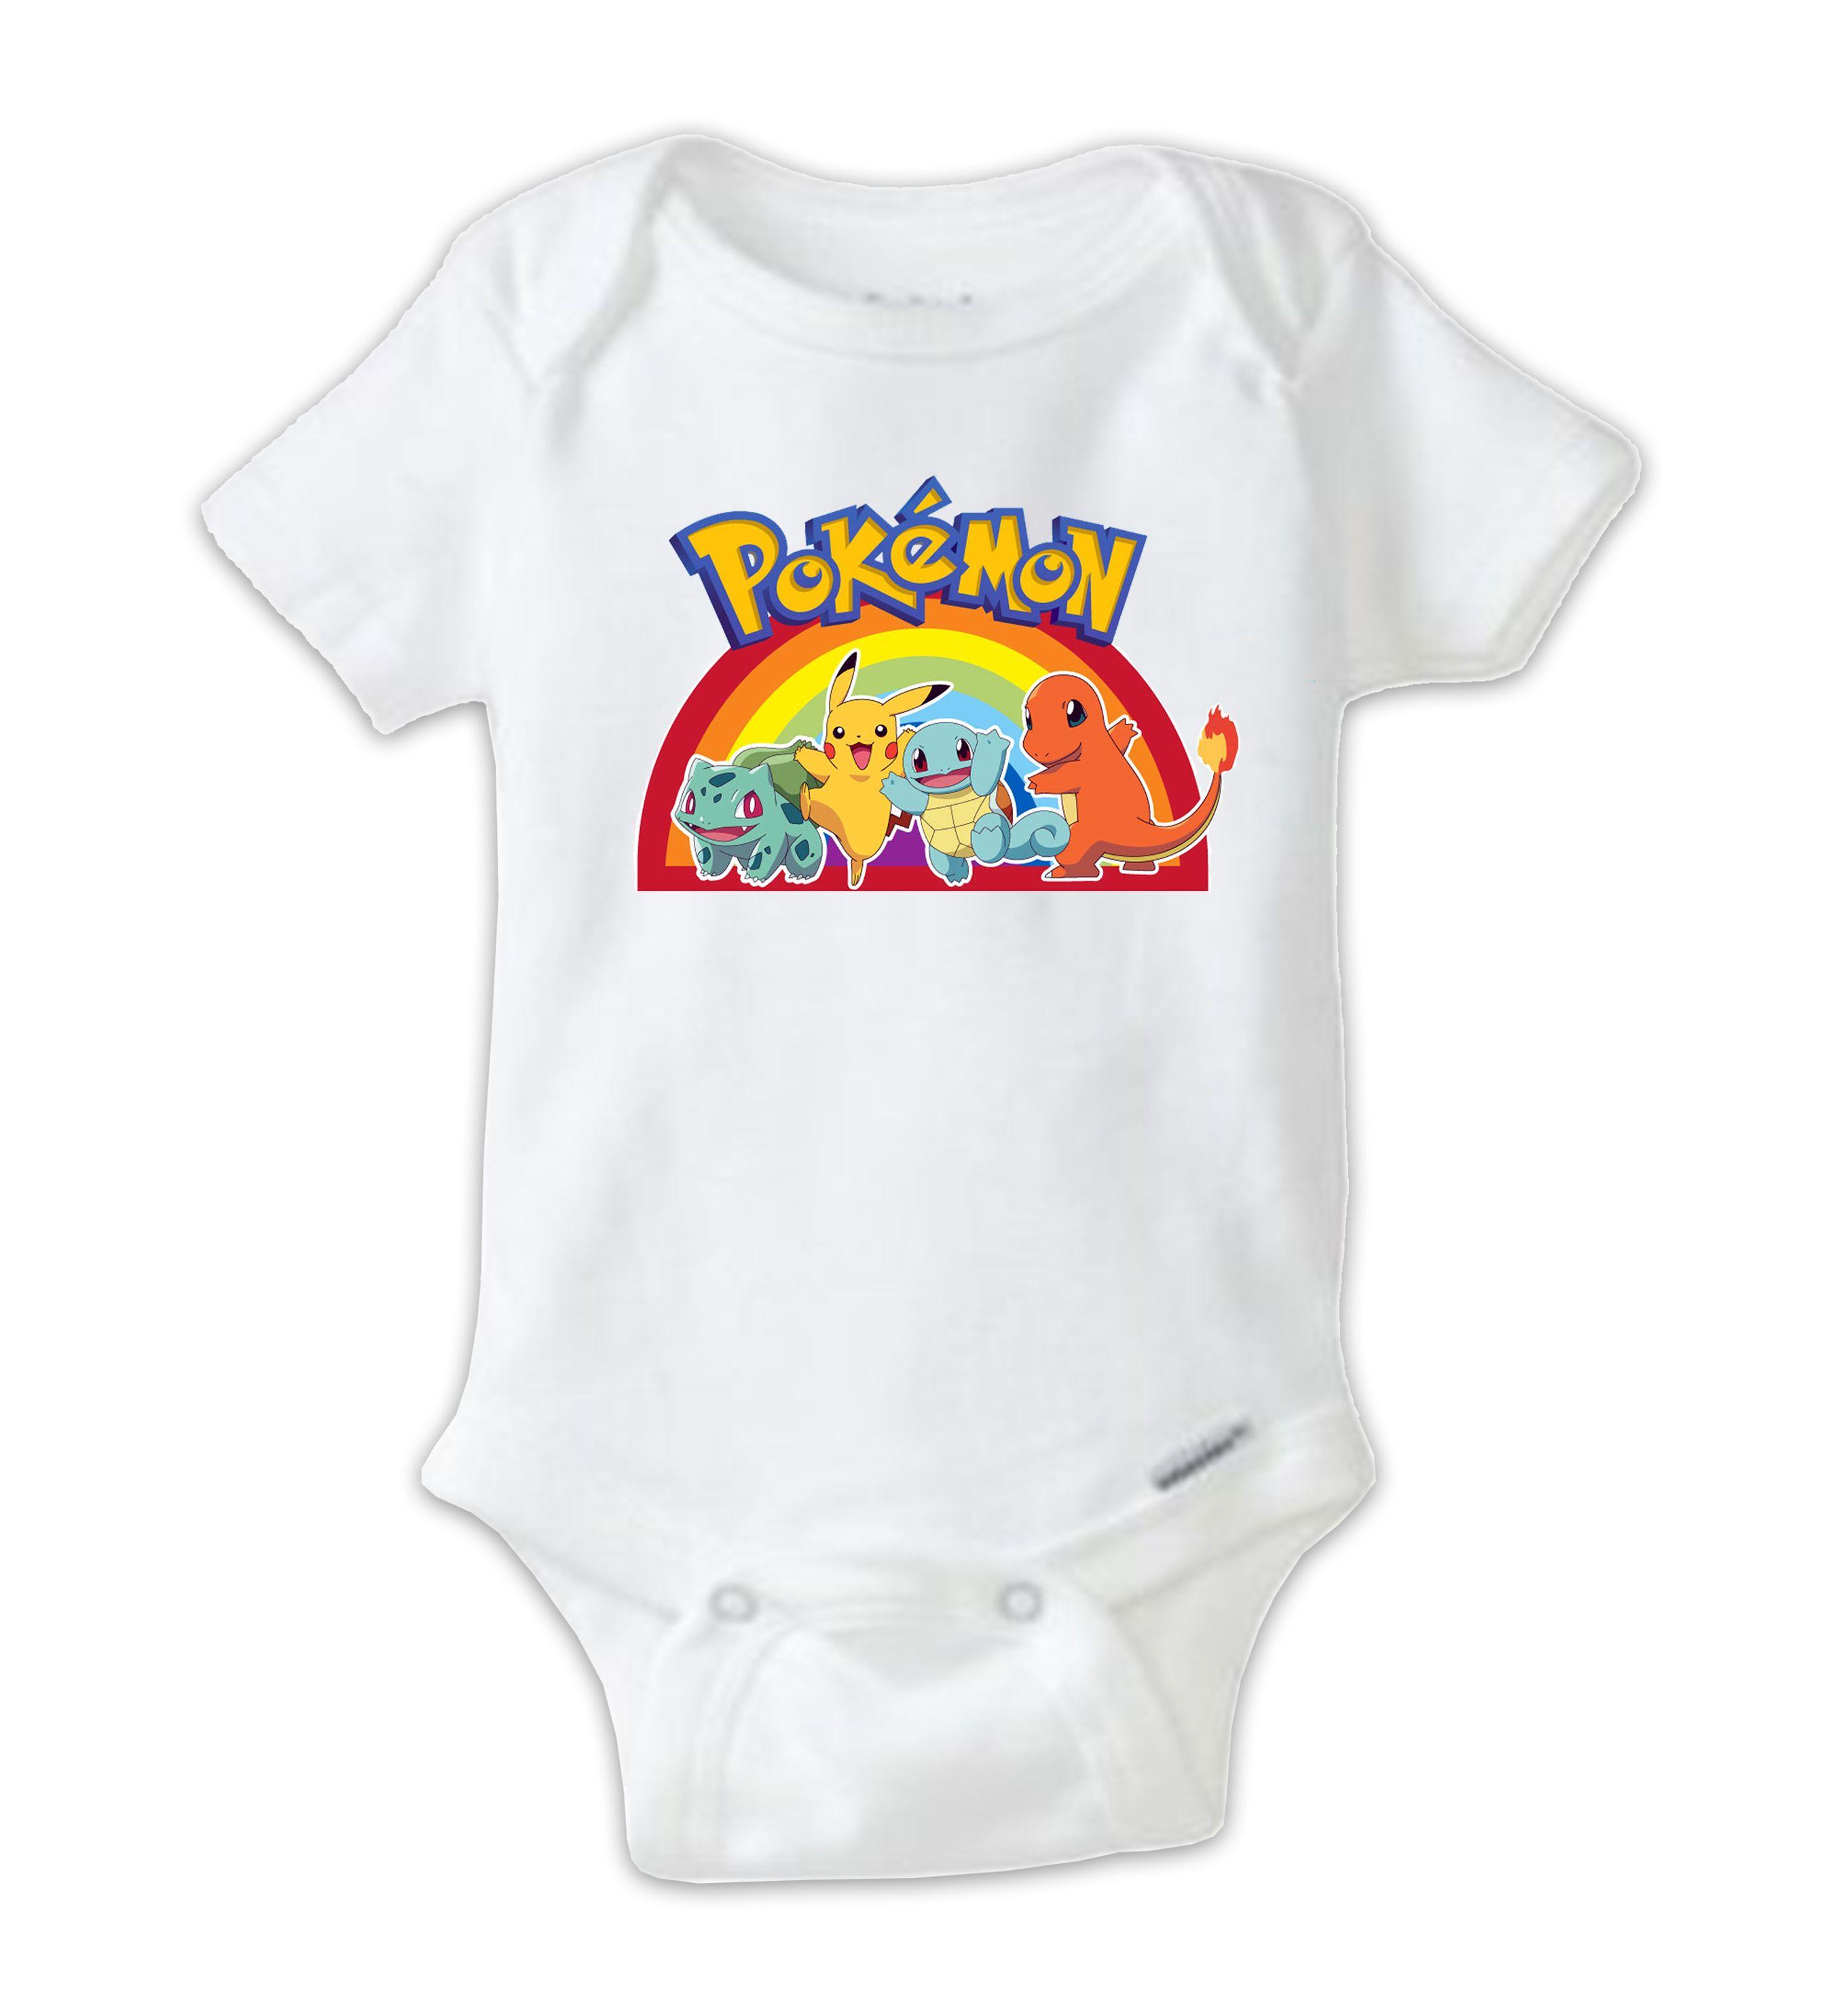 99c5c755 Rainbow POKEMON Baby Onesie, Pokemon Bodysuit, Pokemon Go Shirt, Baby Shower